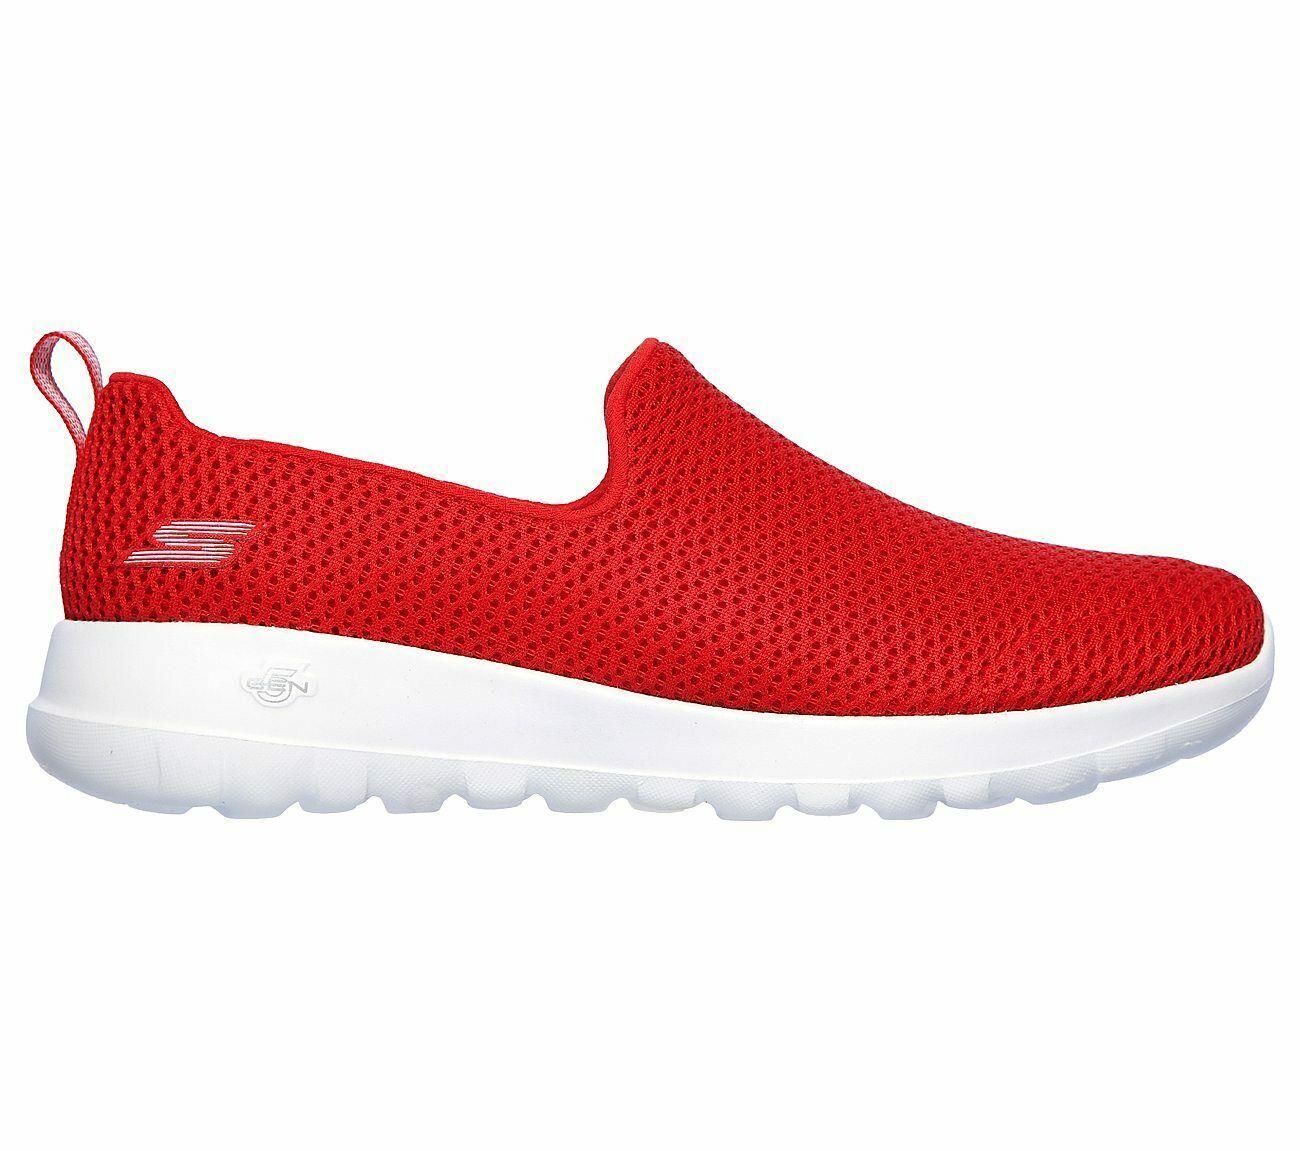 Skechers Shoes Red Go Walk Joy Women Sport Soft Casual Slipon Comfort Mesh 15600 image 2